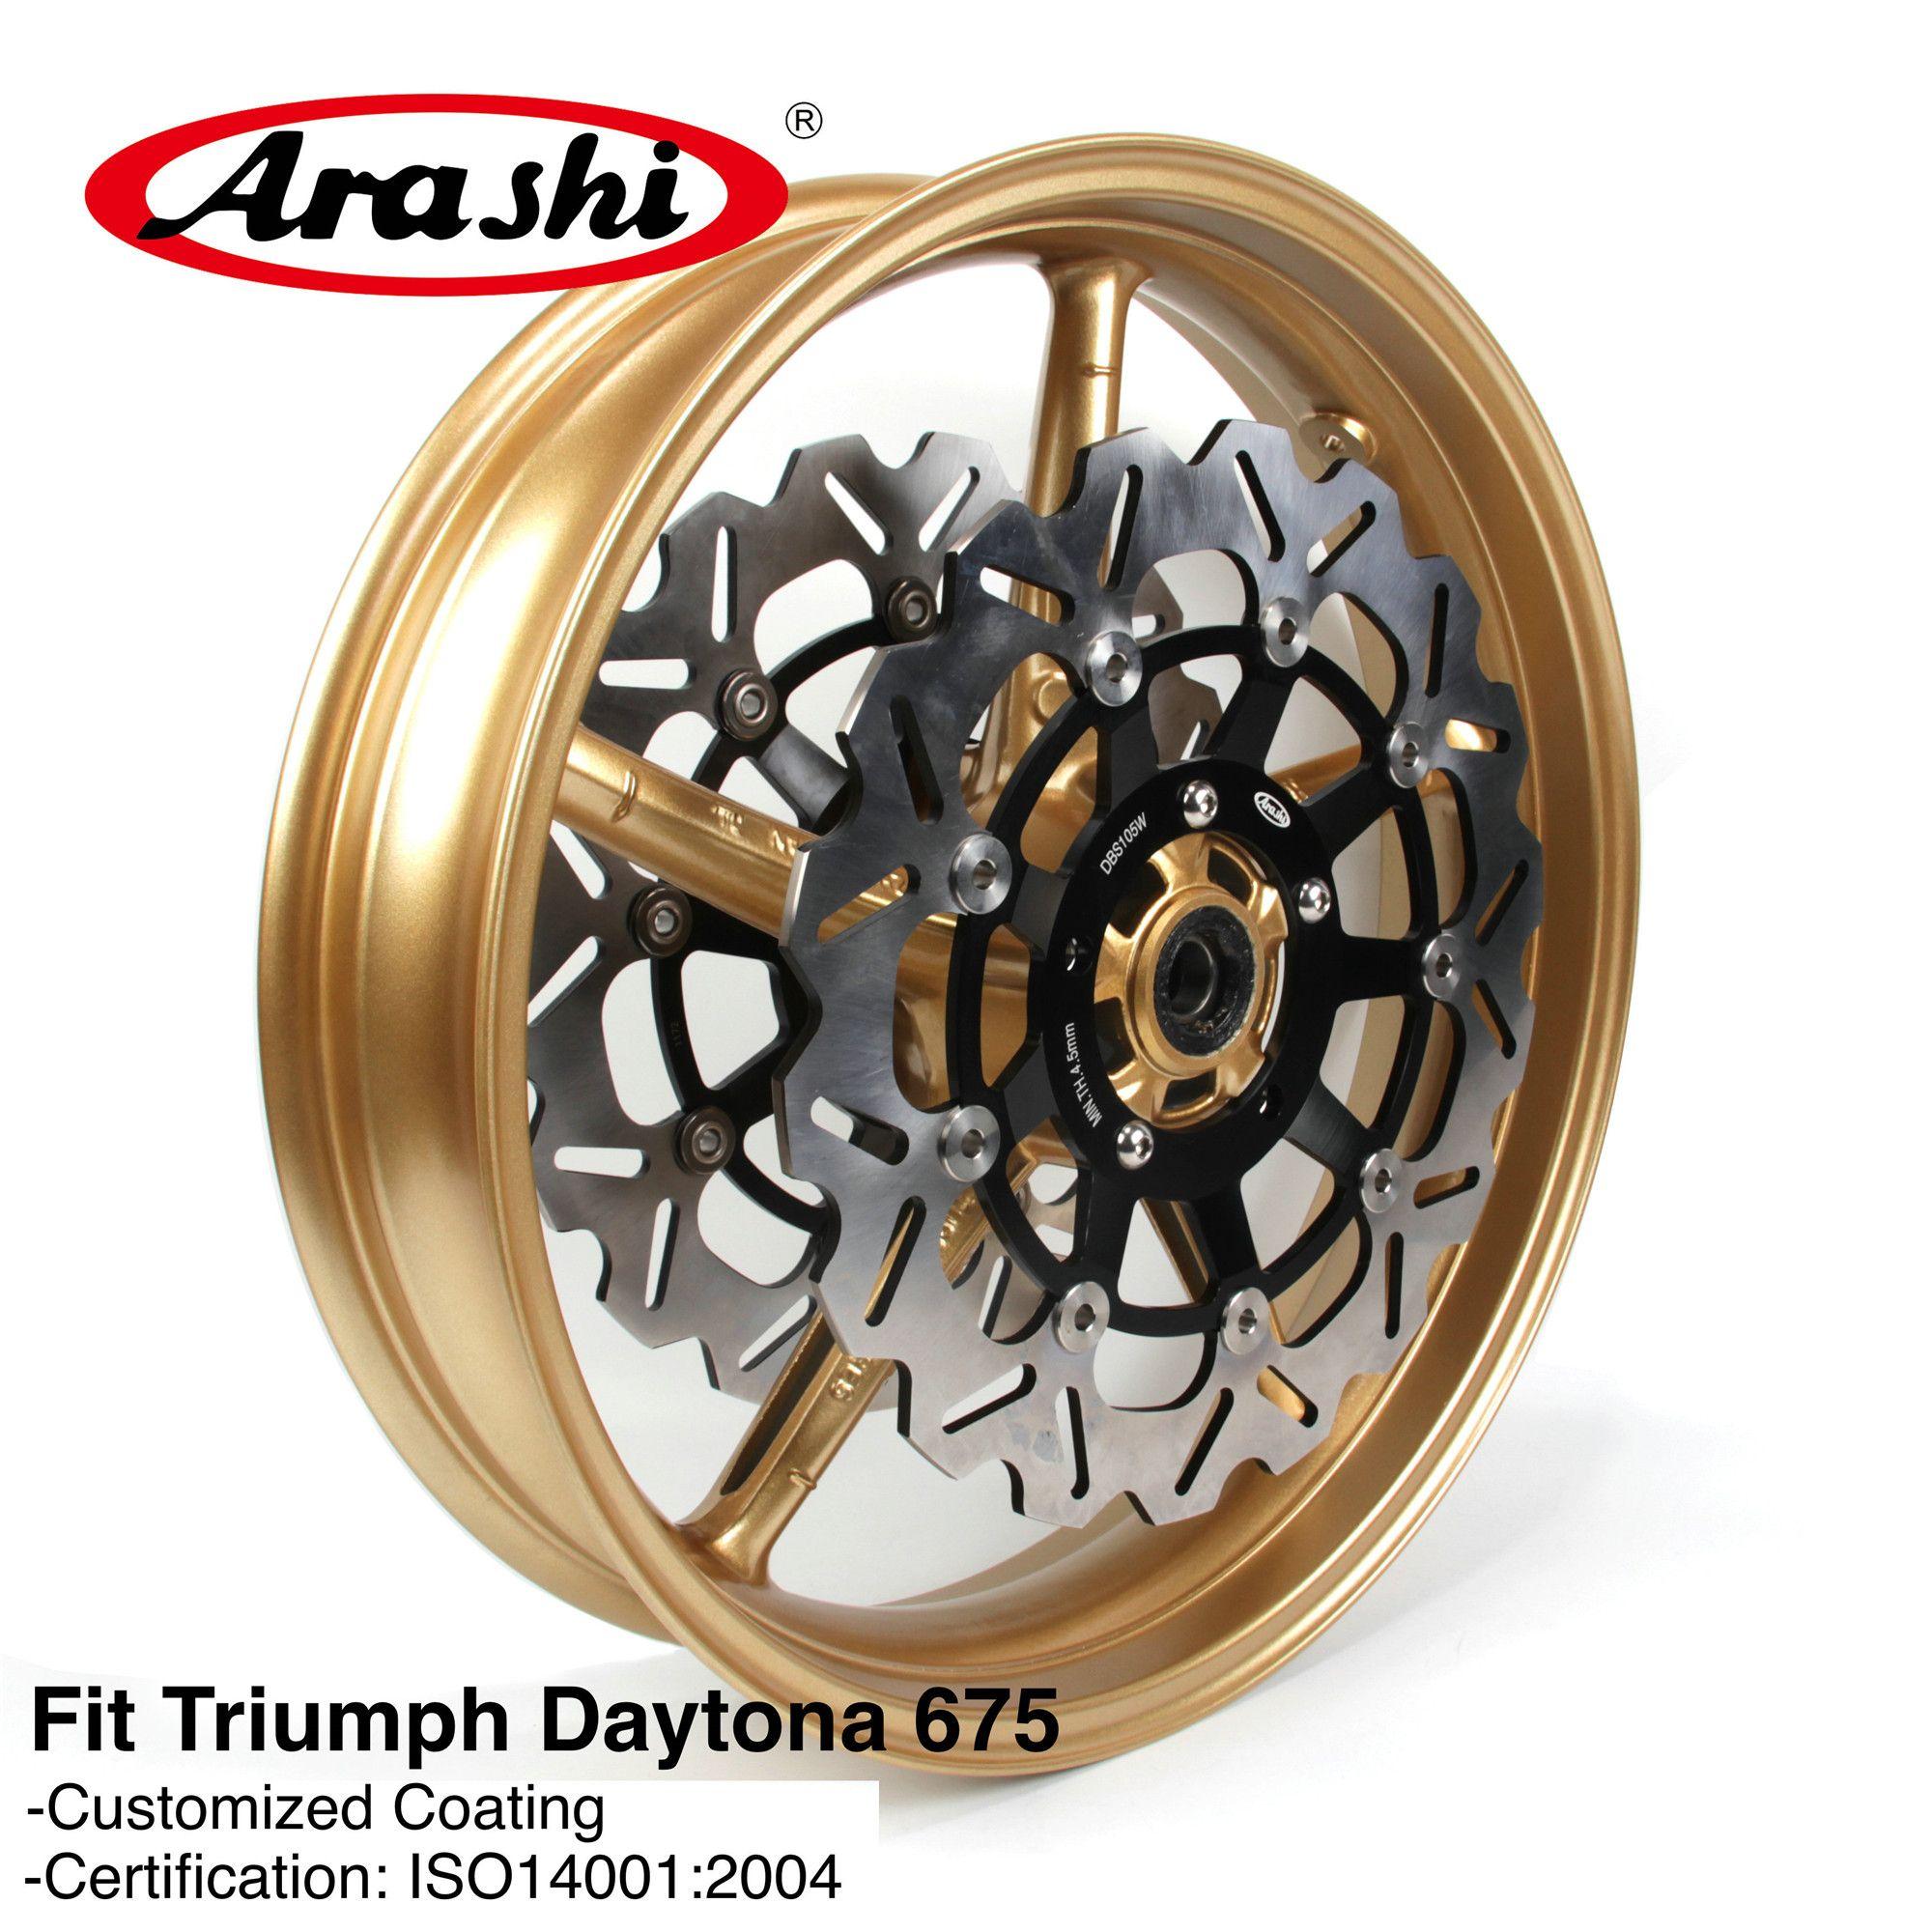 2019 Arashi For Triumph Daytona 675 2006 2012 Front Wheel Rim Brake